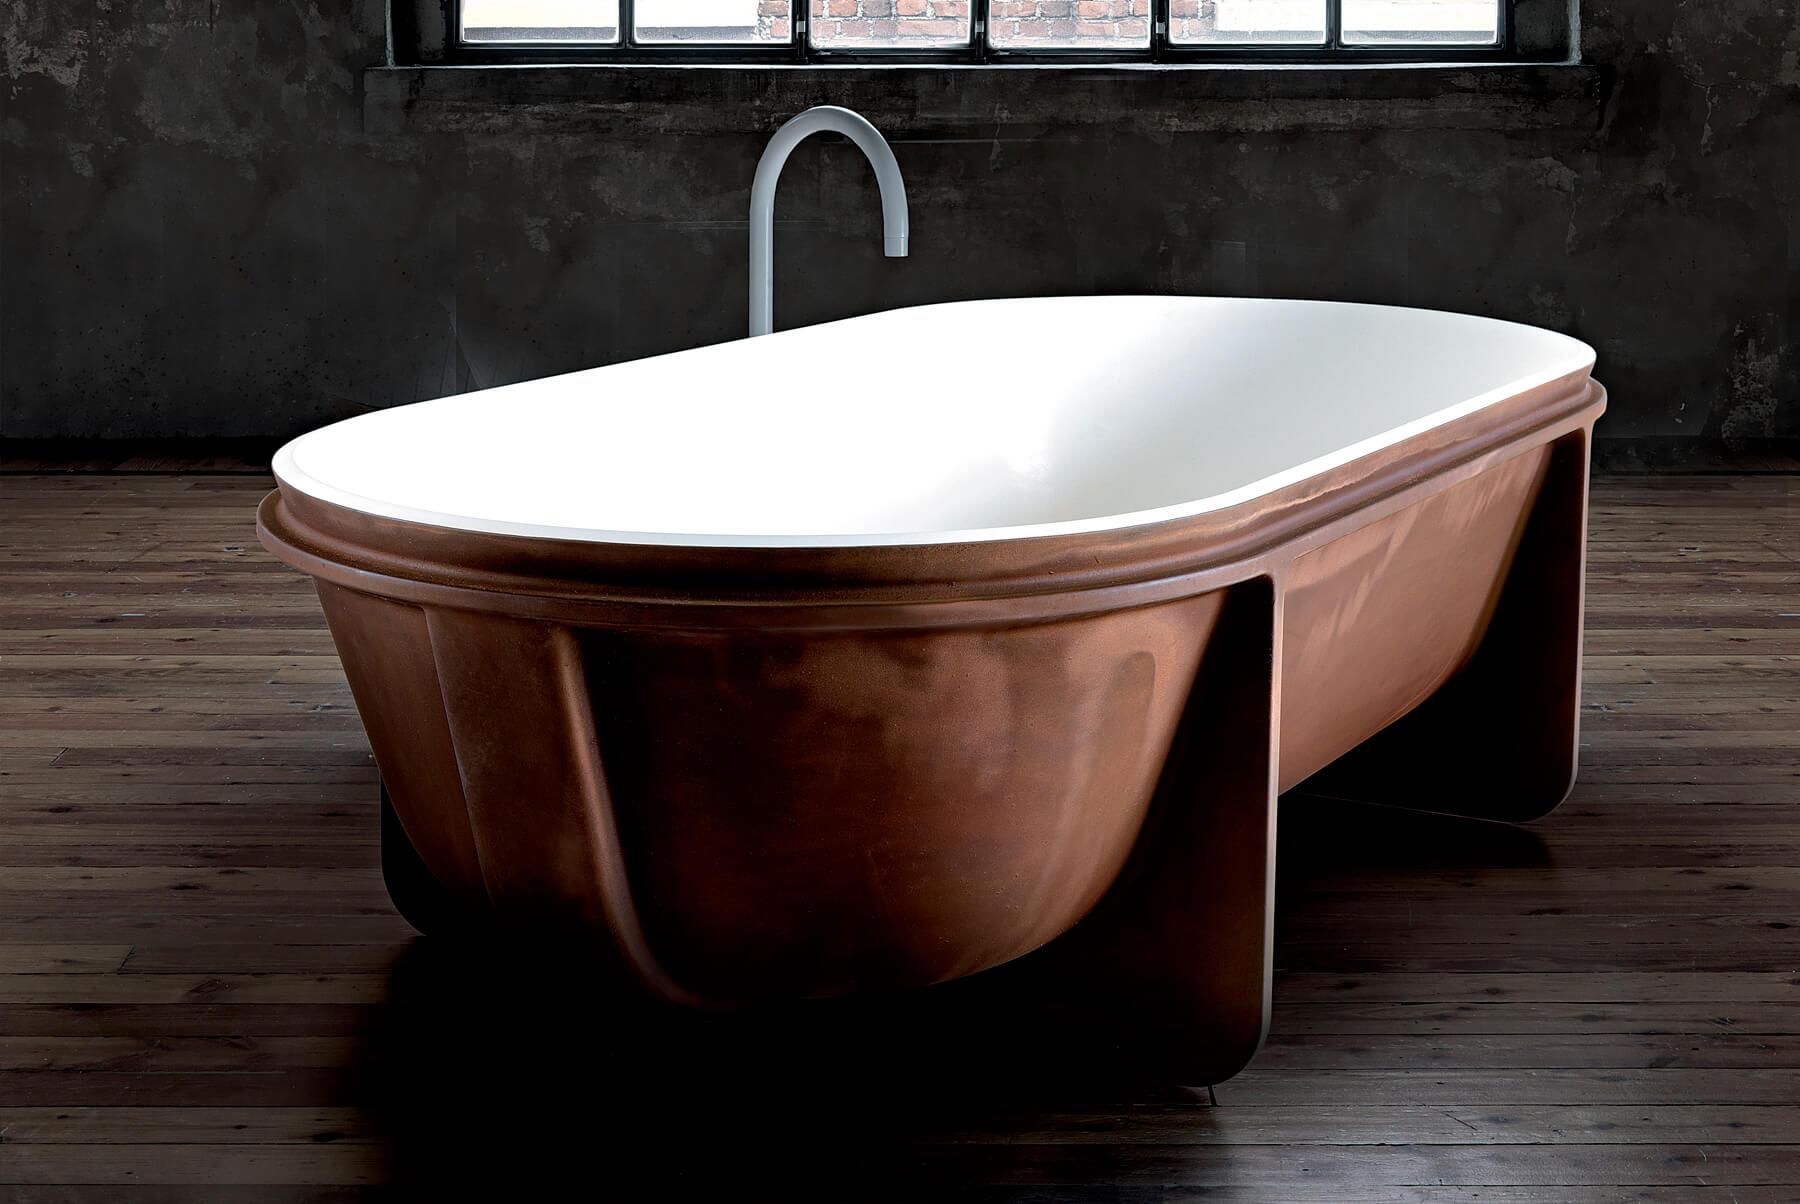 Bath-Tubs-Falper-Controstampo-angle1800x1204